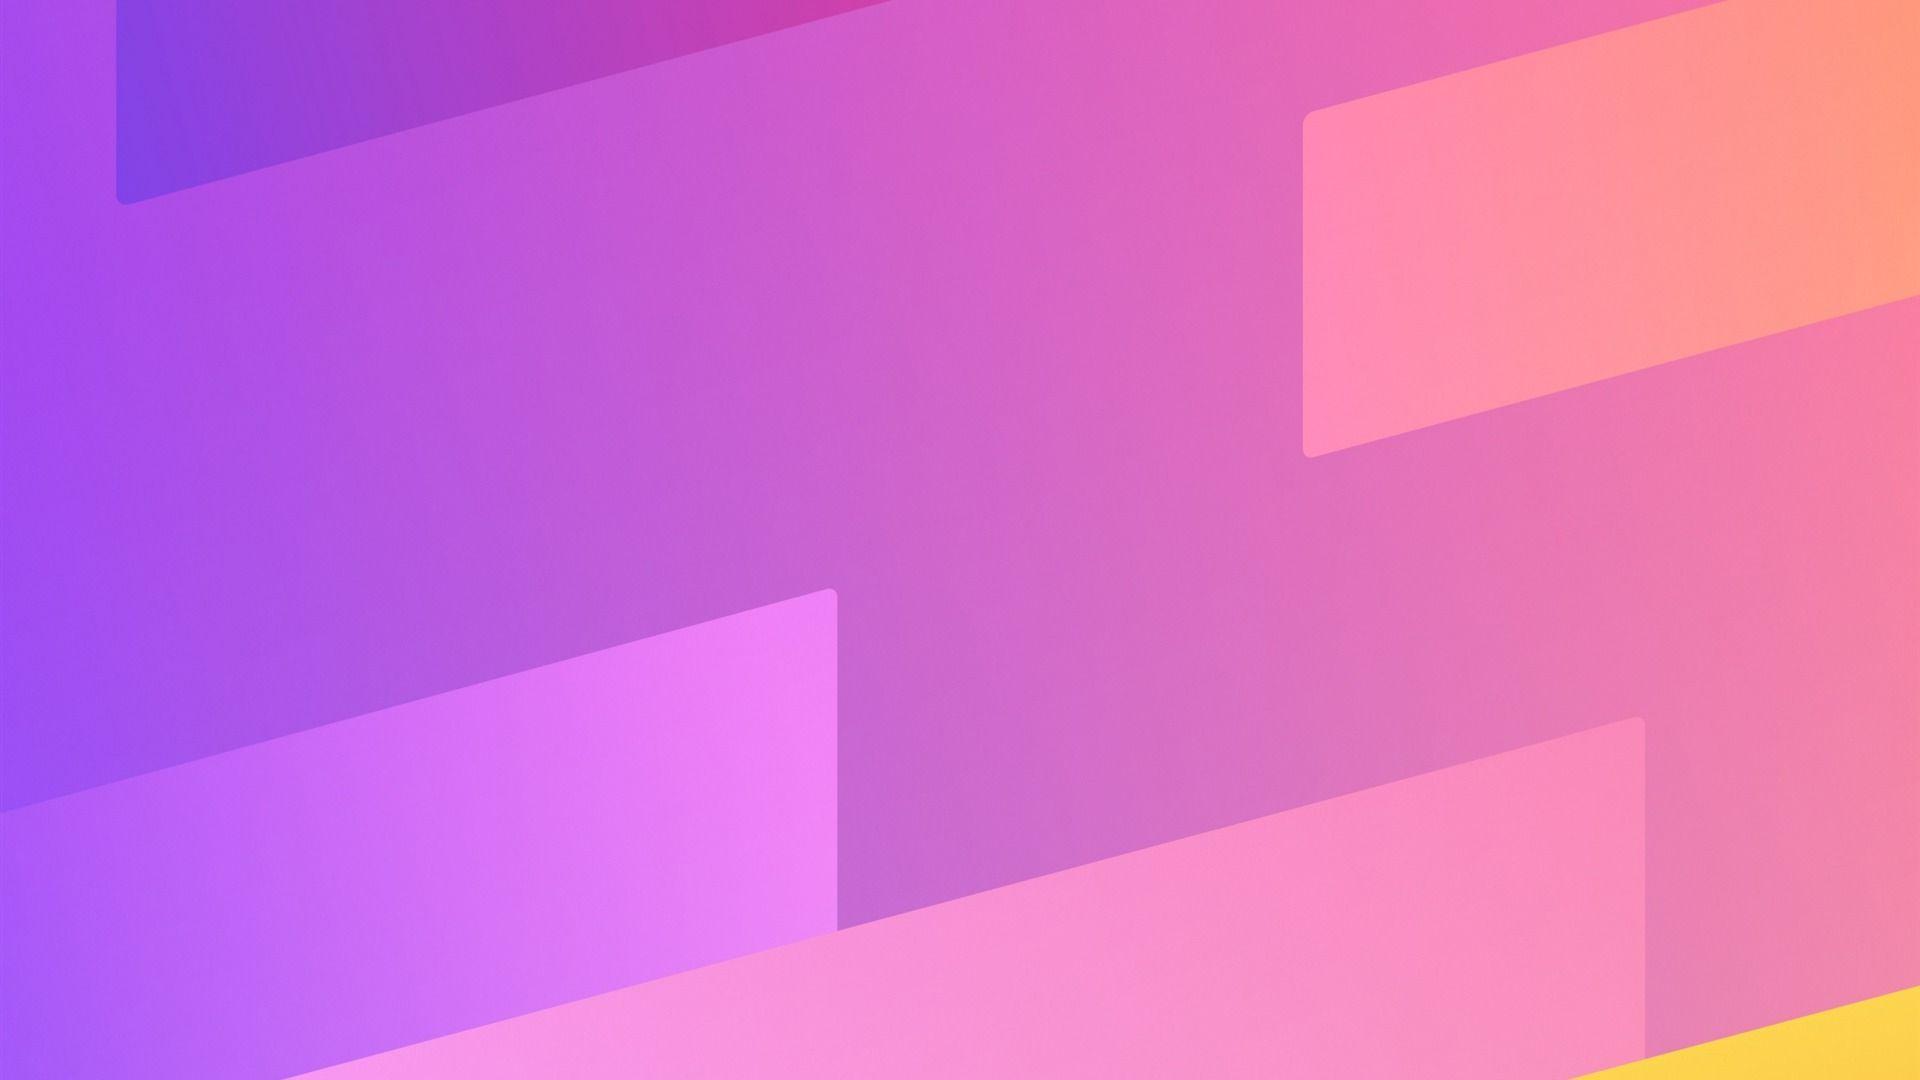 Opera 1080p wallpaper